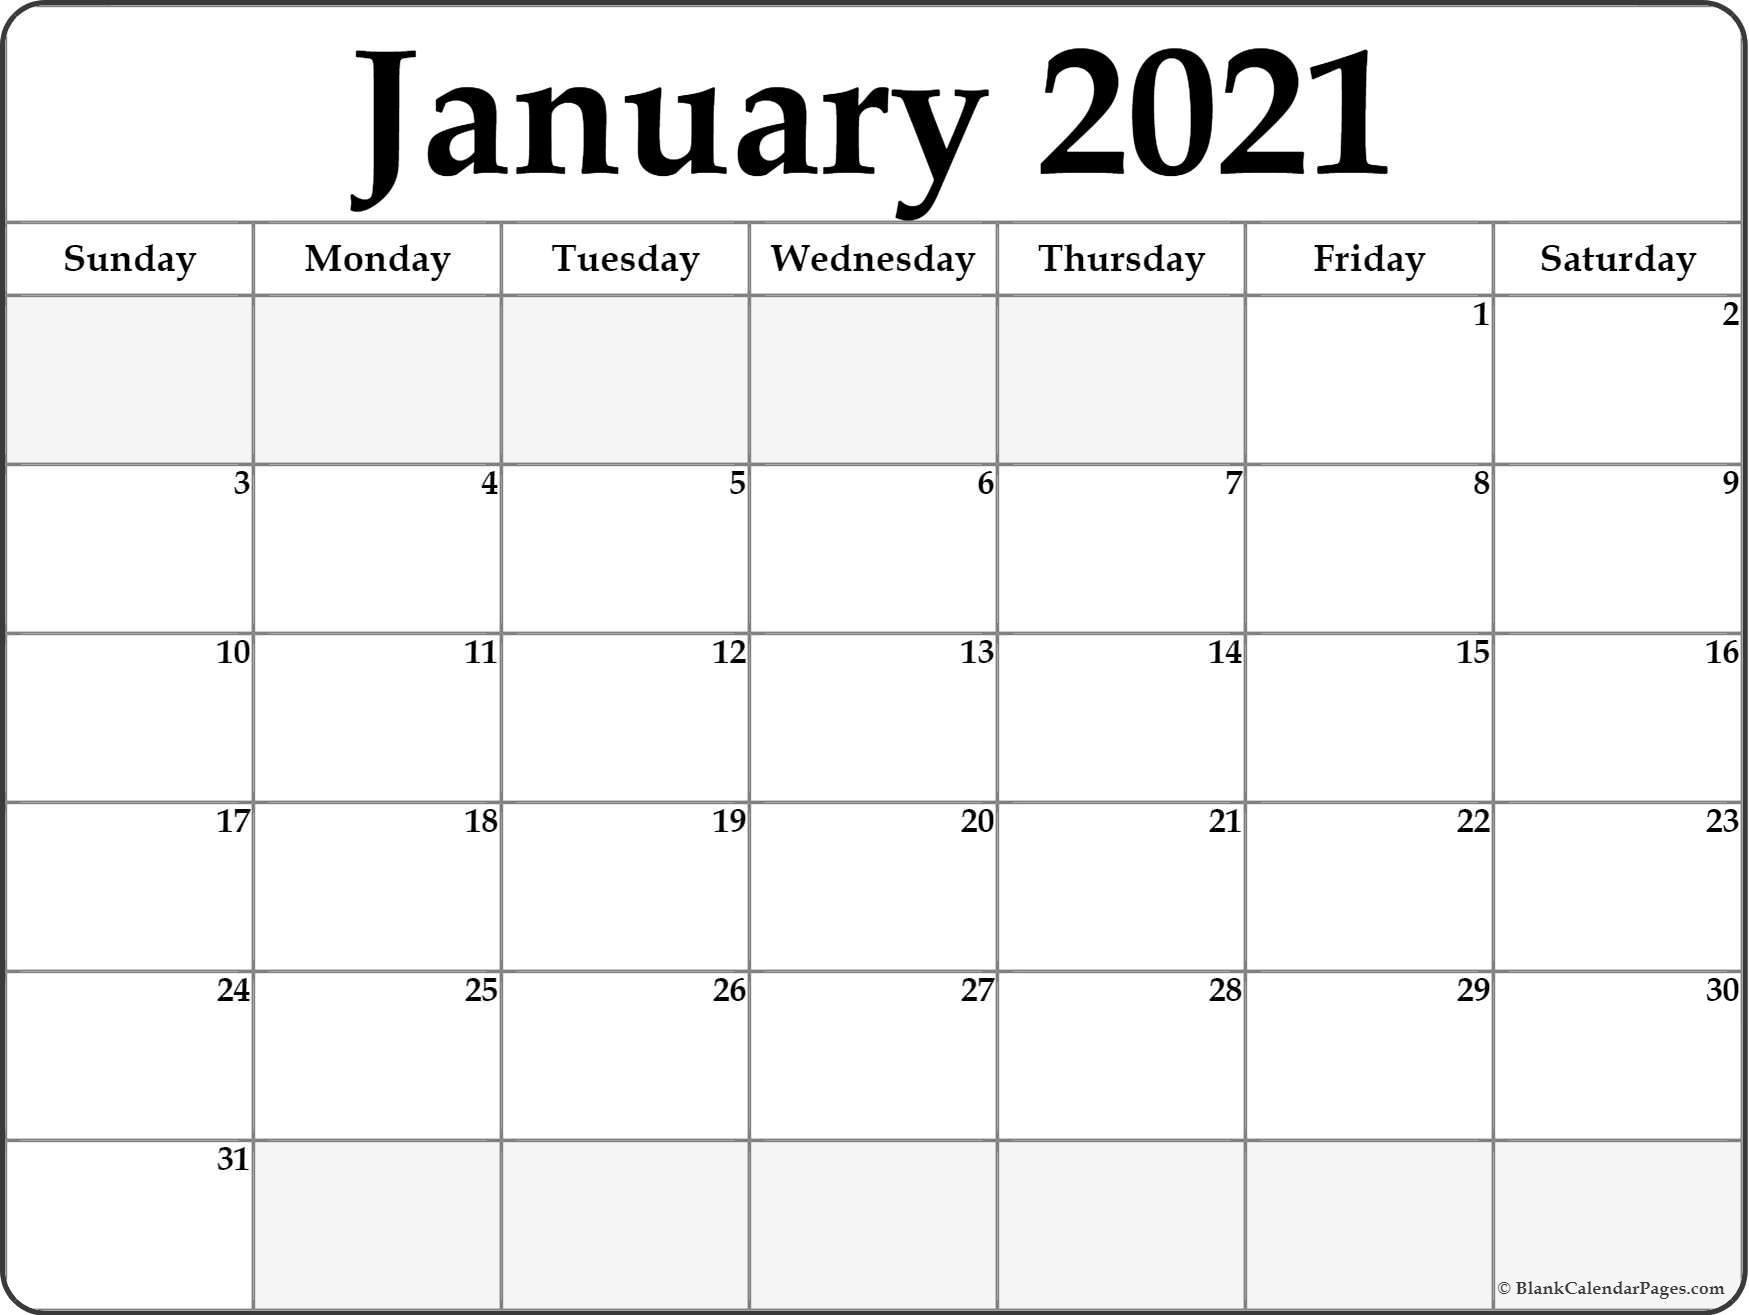 January 2021 Blank Calendar Collection.